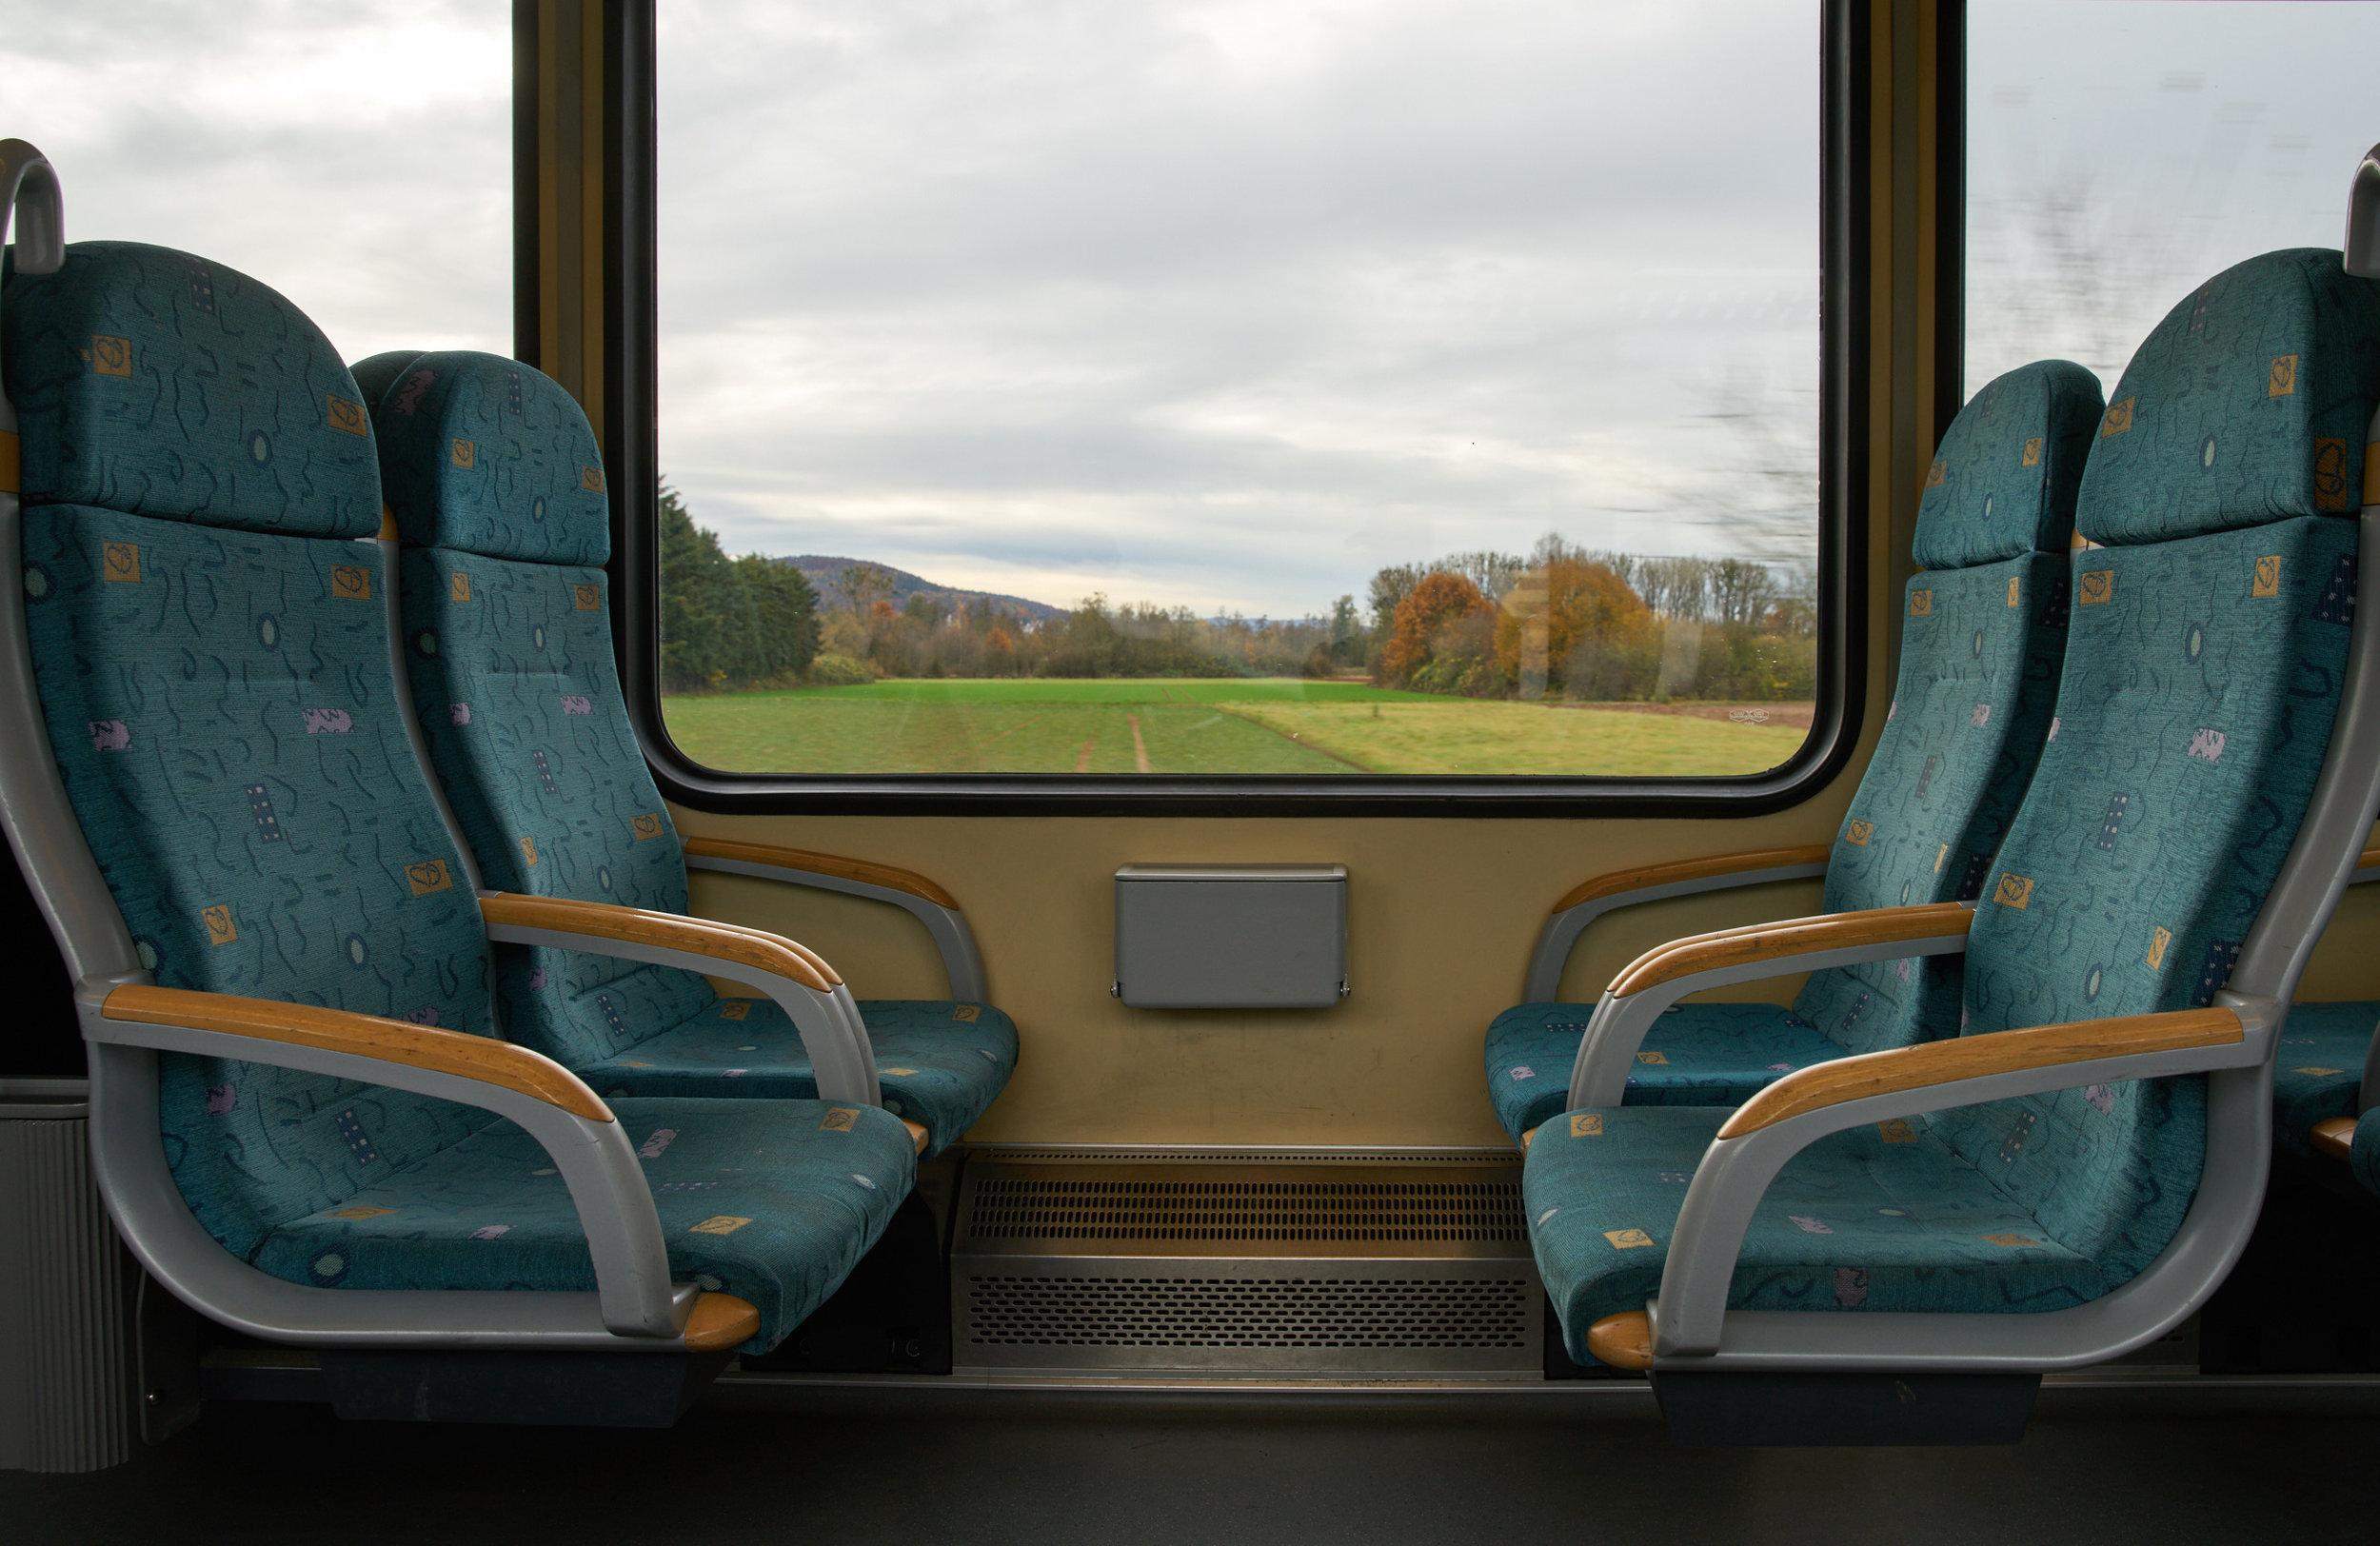 Train to Büdingen